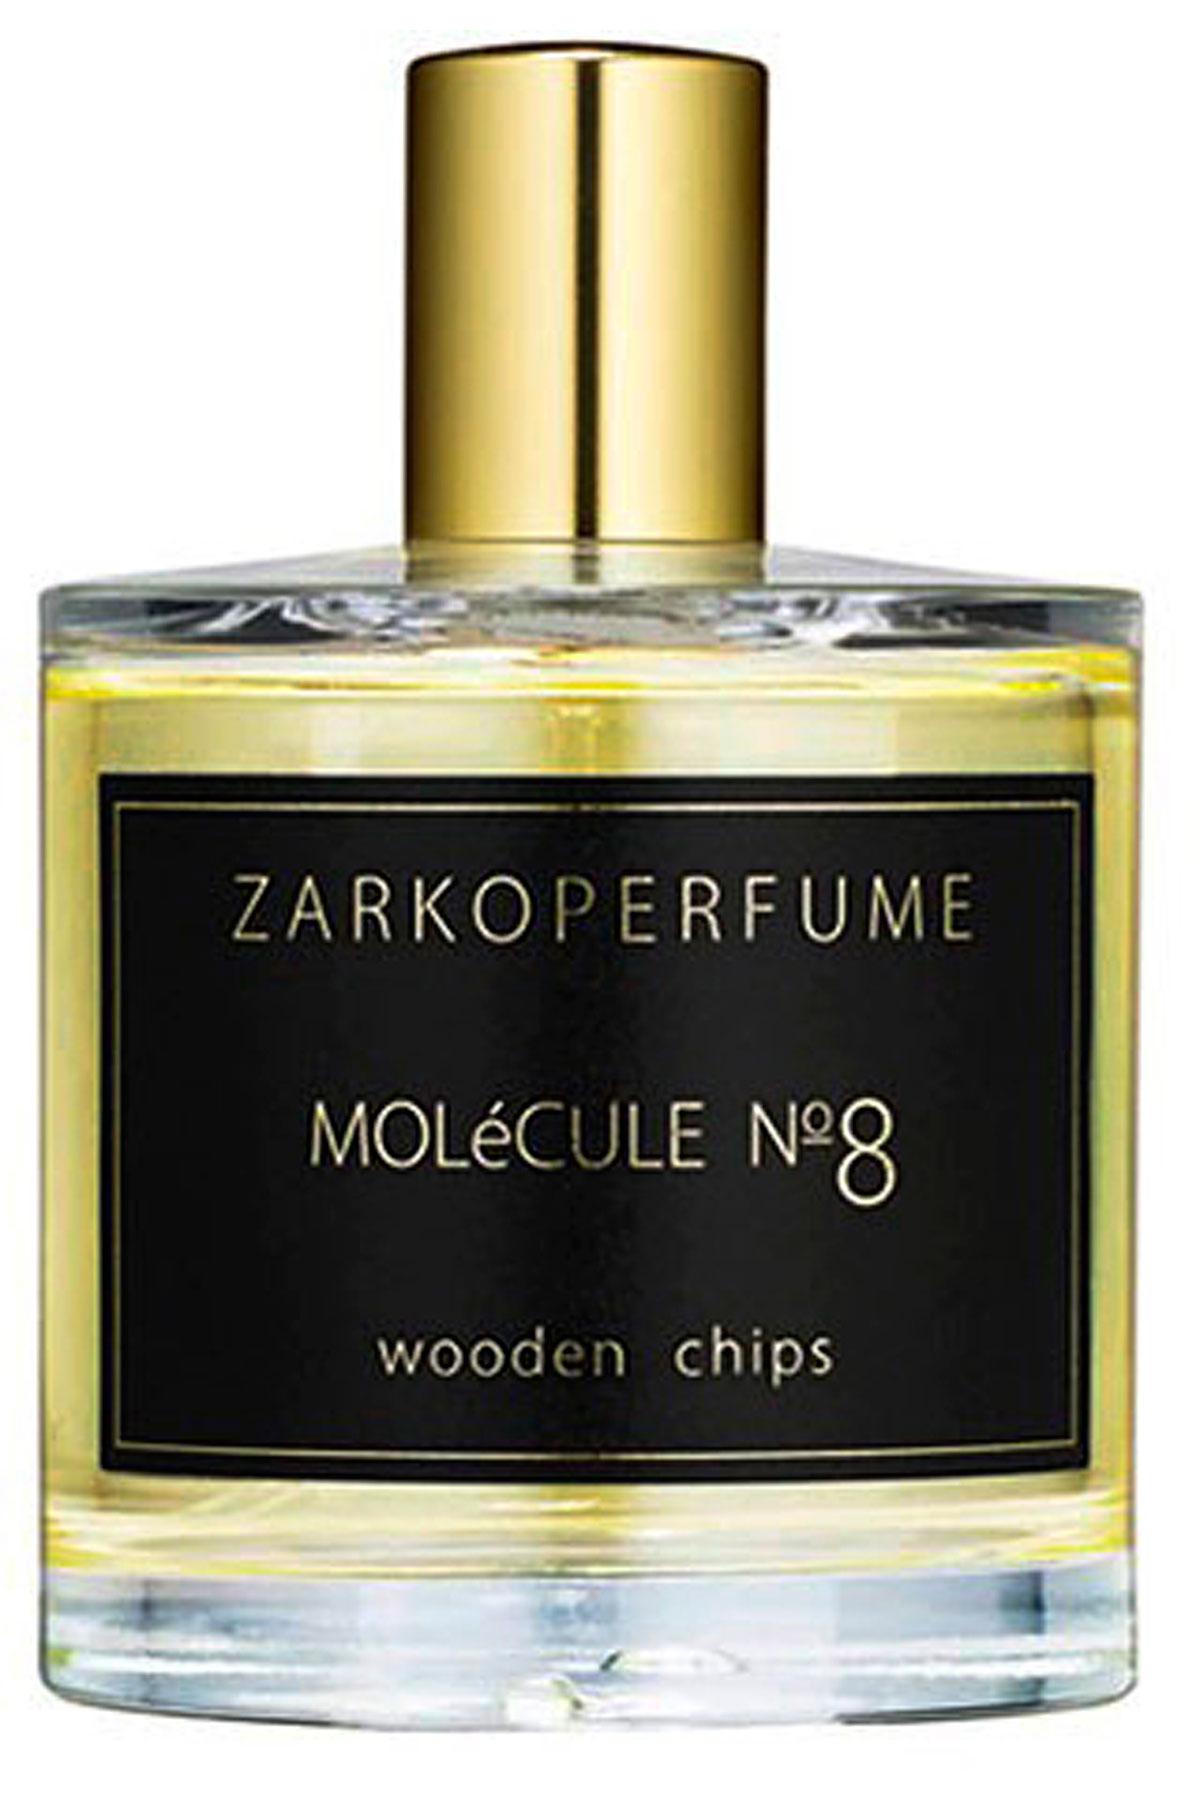 Zarkoperfume Fragrances for Men, Molecule N.8 Wooden Chips - Eau De Parfum - 100 Ml, 2019, 100 ml